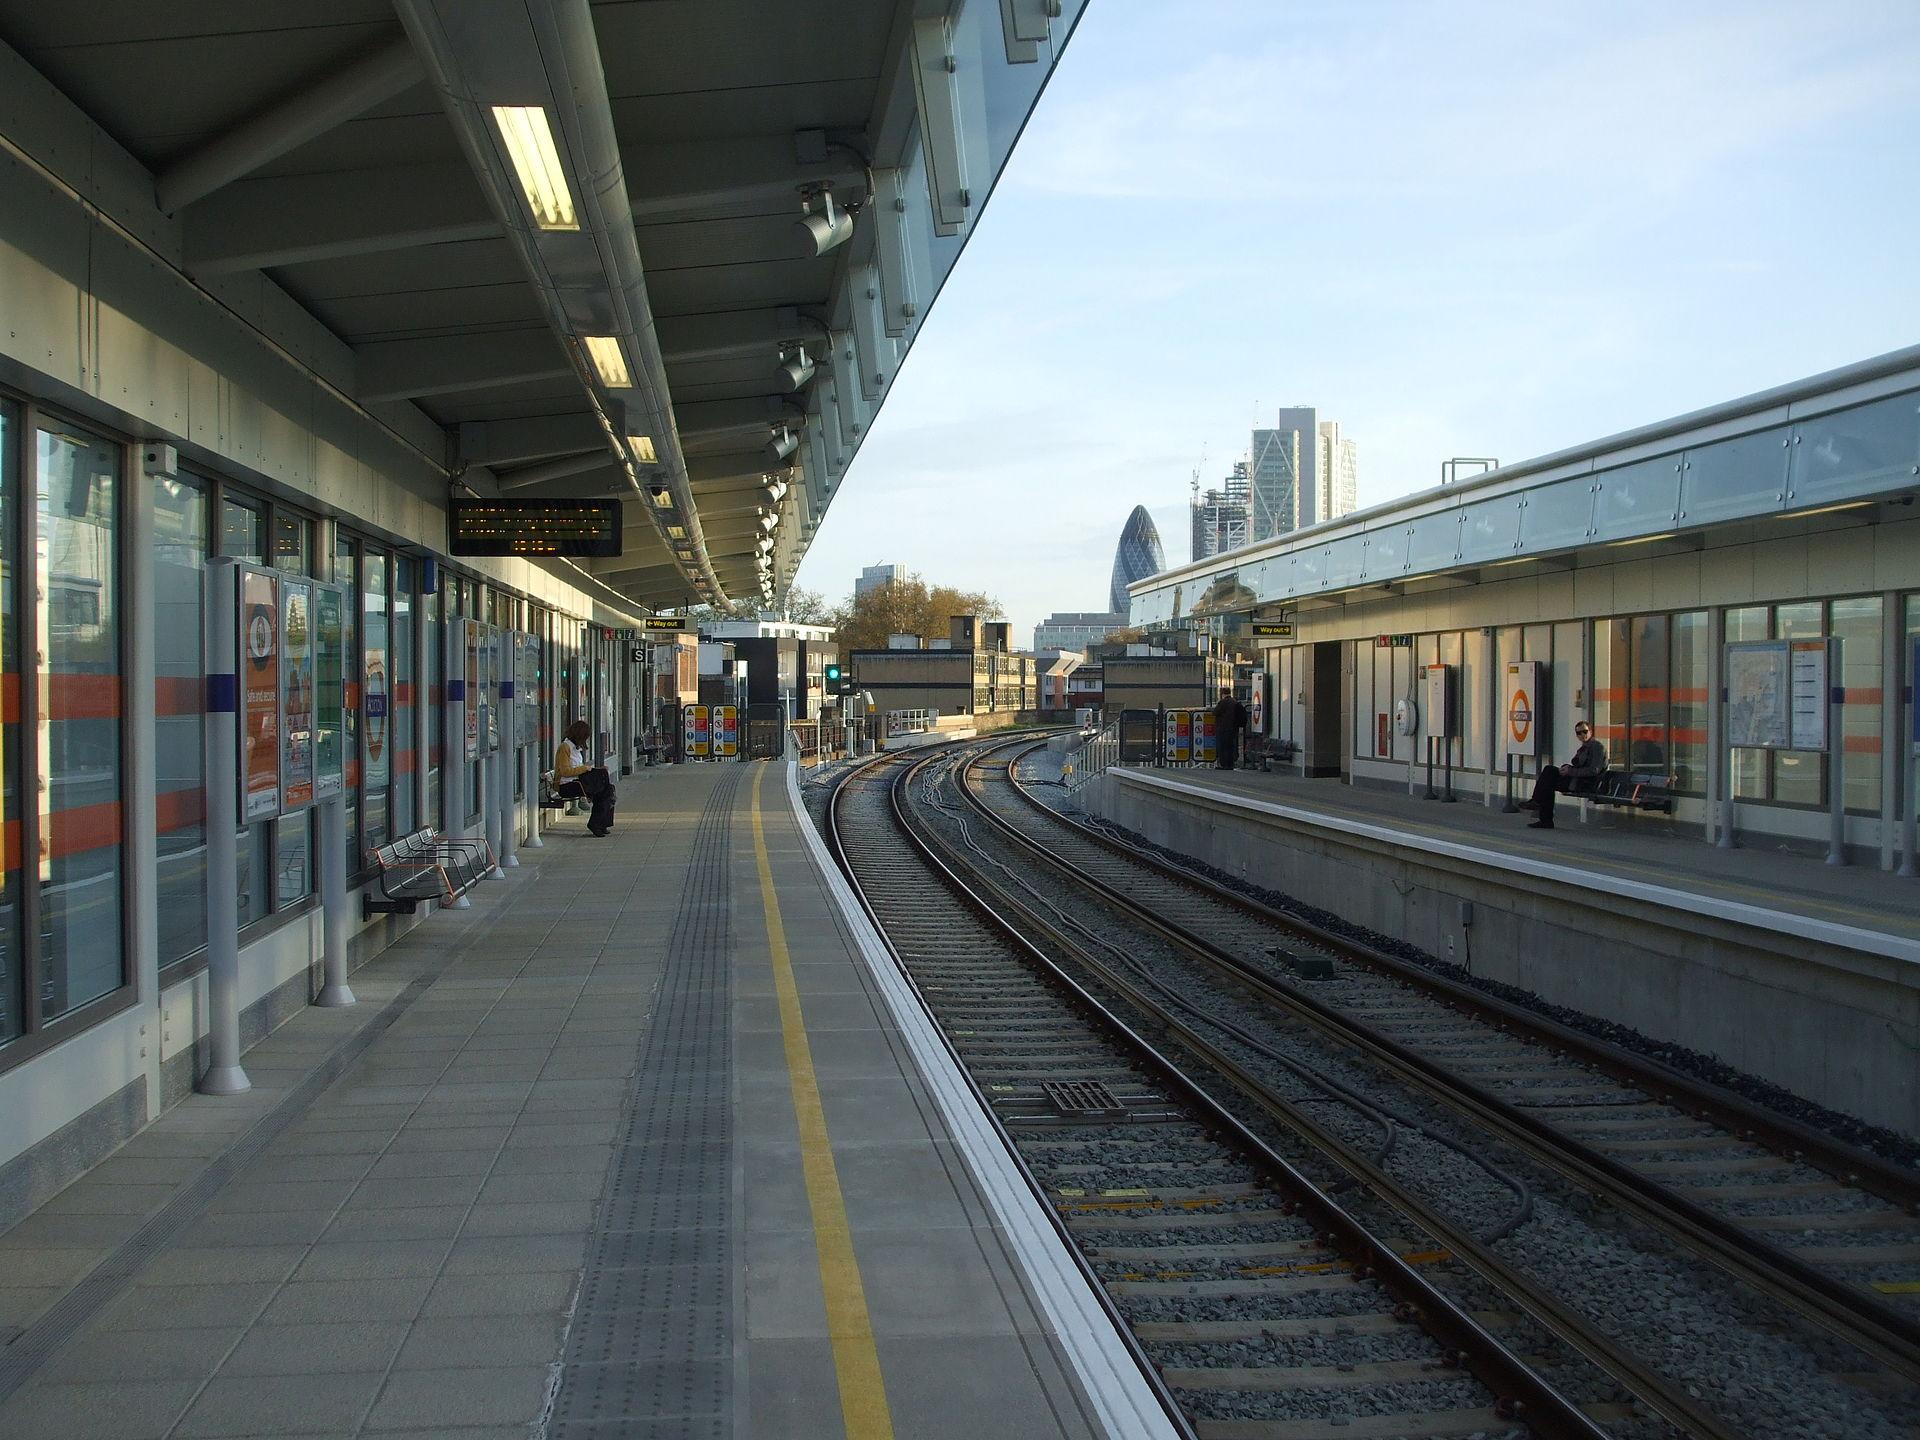 Hoxton railway station - Wikipedia